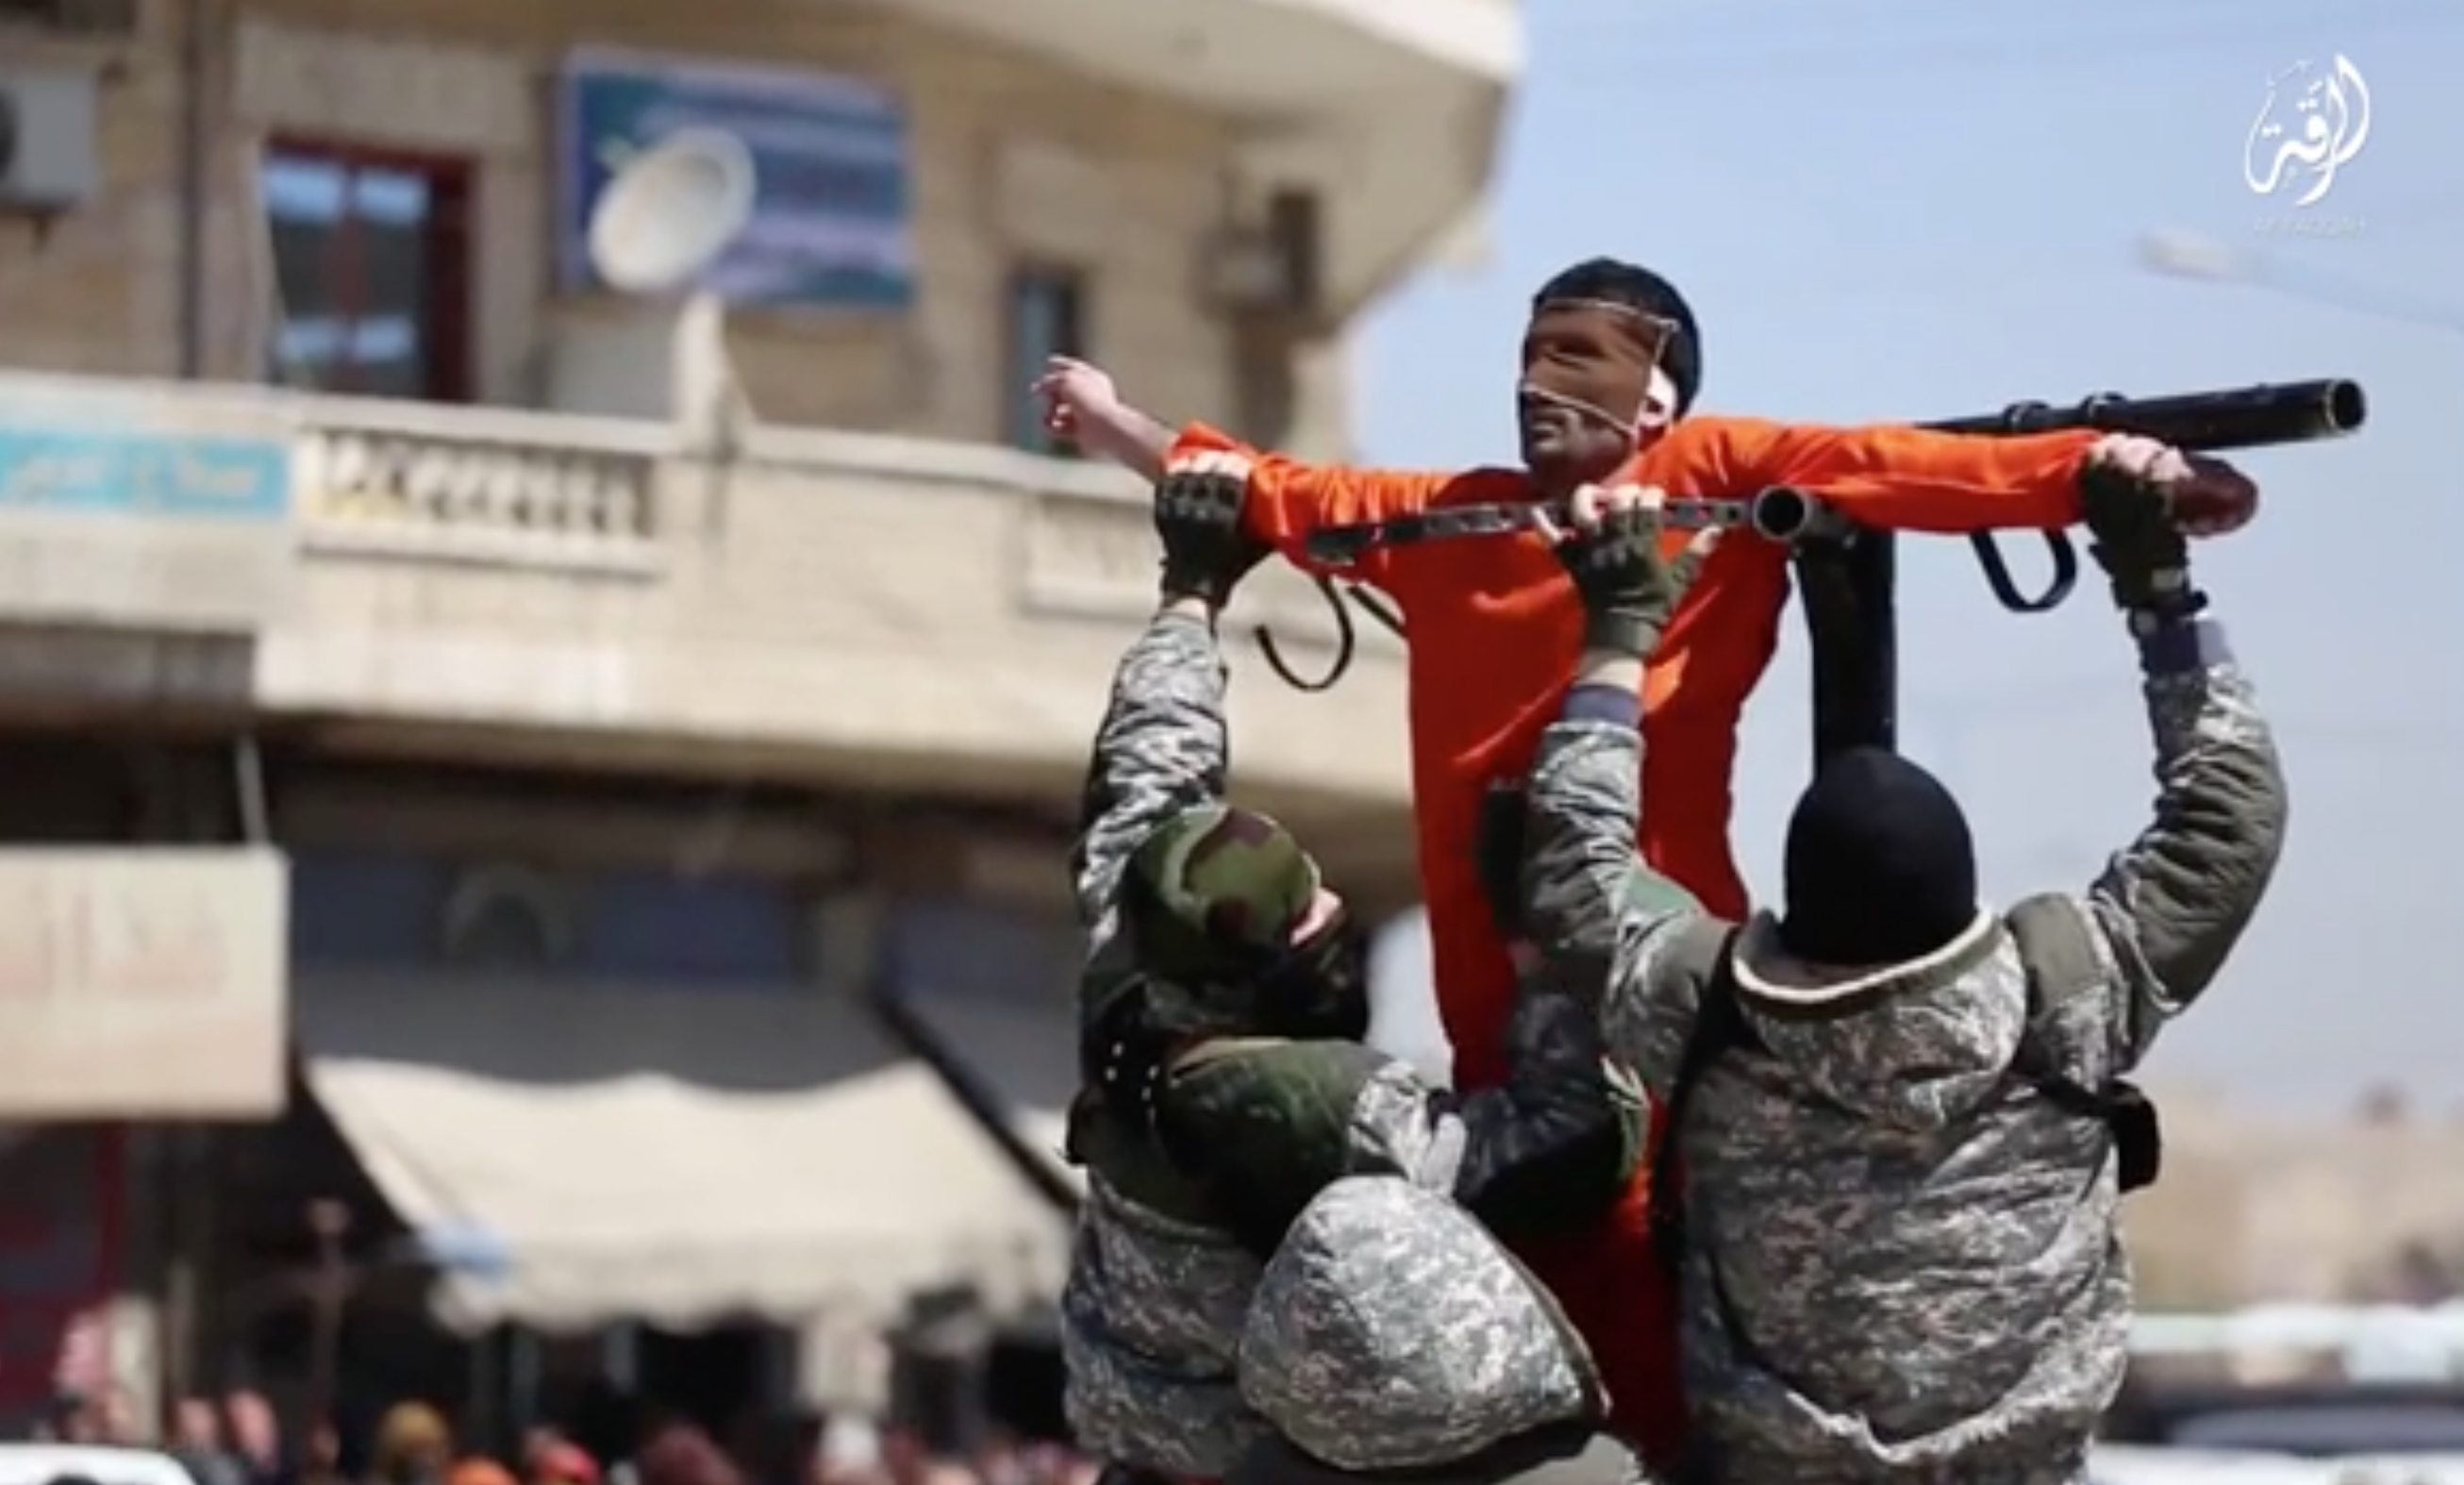 Пропаганда ИГИЛ отходит от заявлений о создании халифата